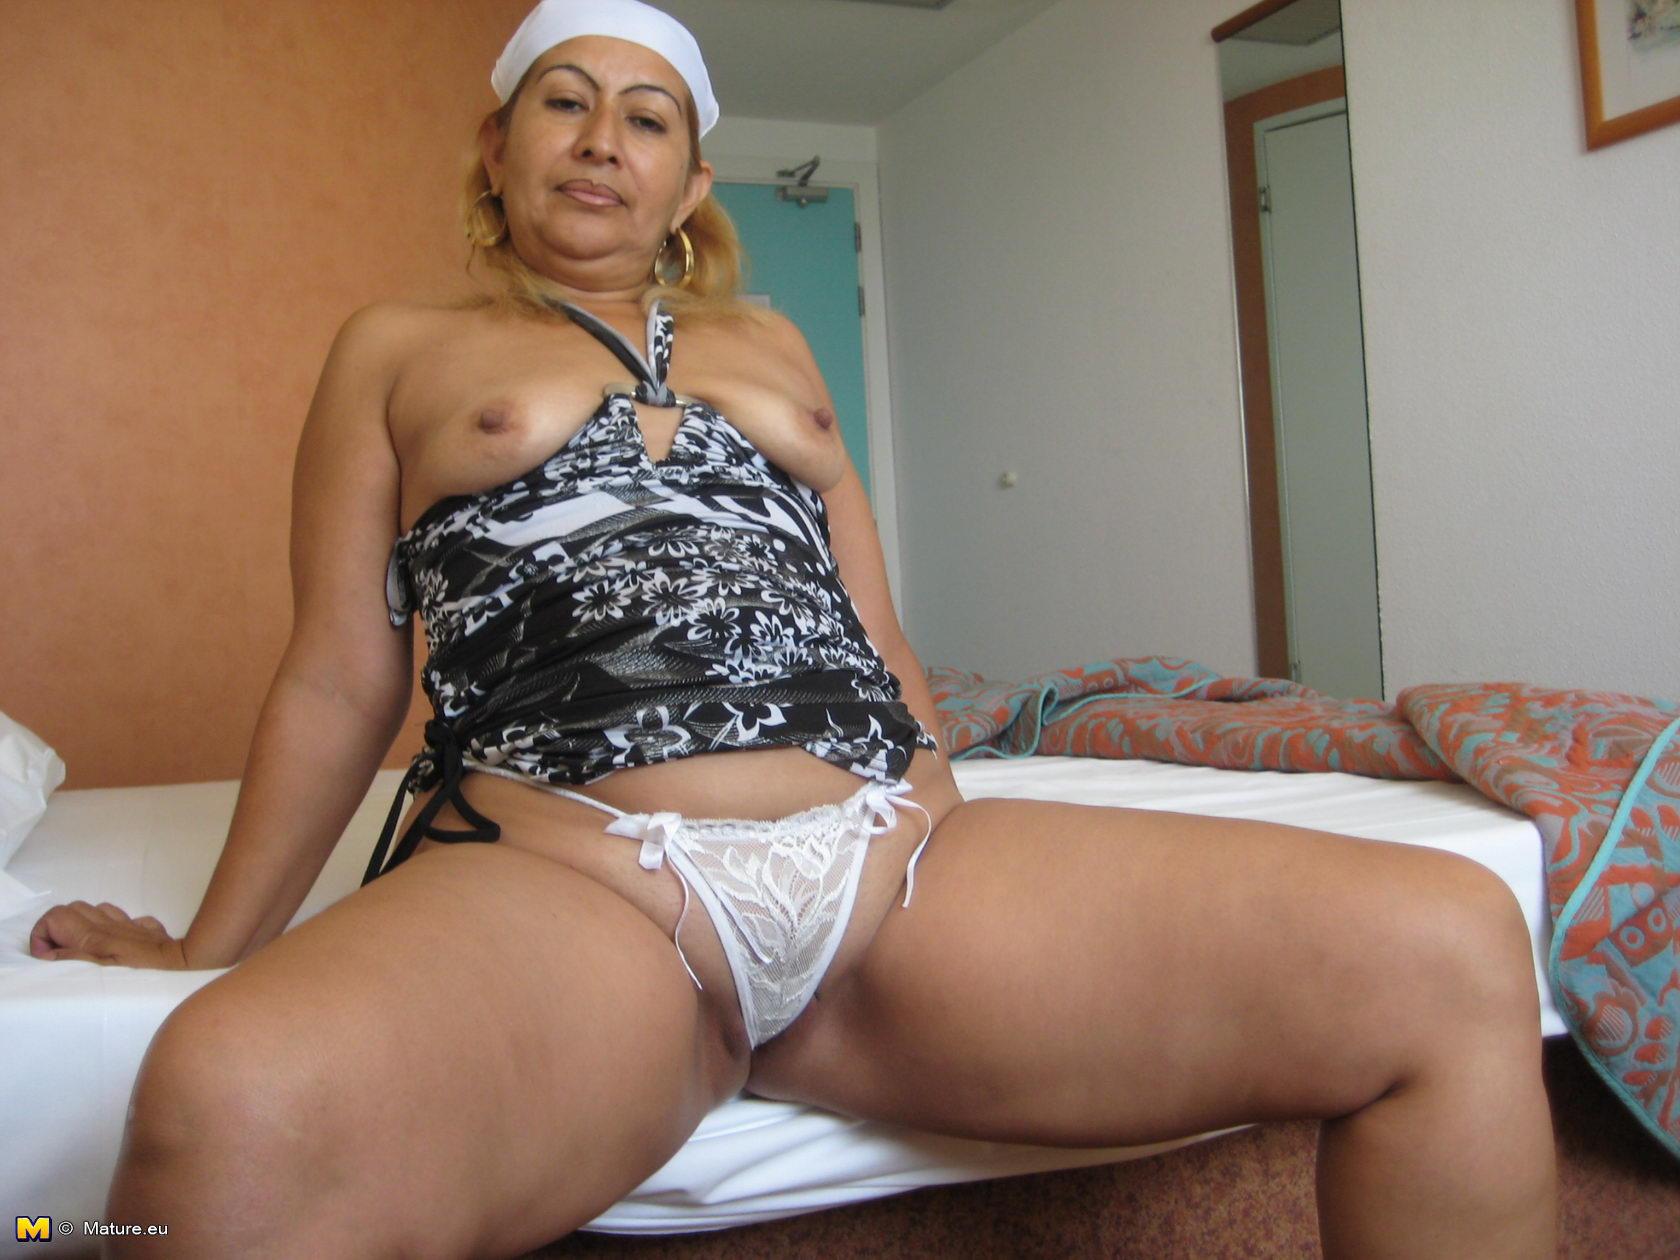 Секс с туркменками 17 фотография